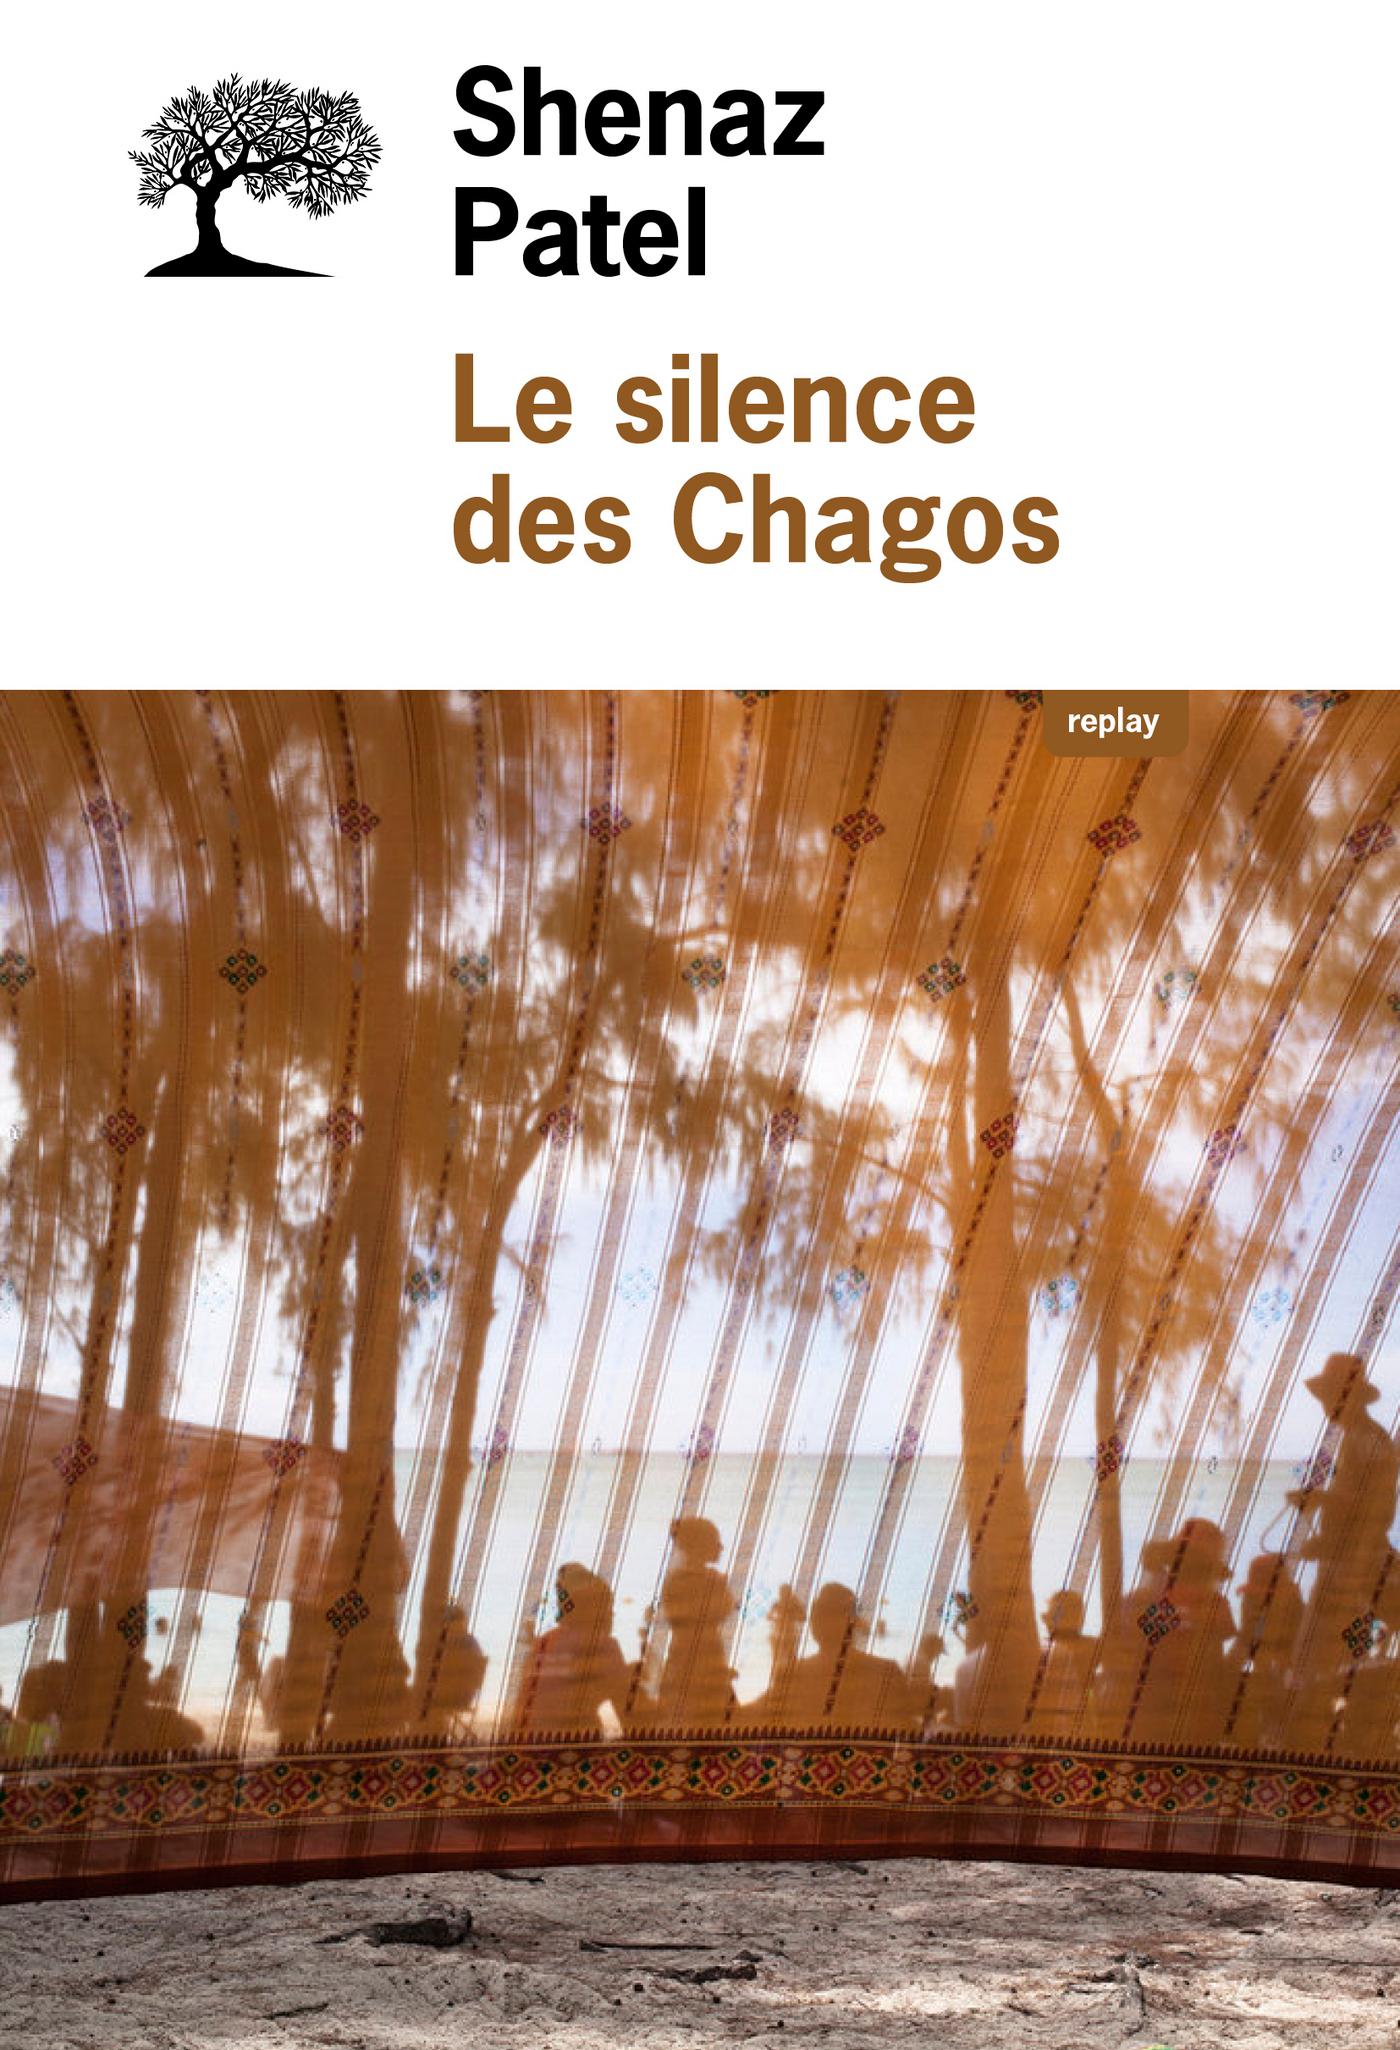 Le silence des Chagos